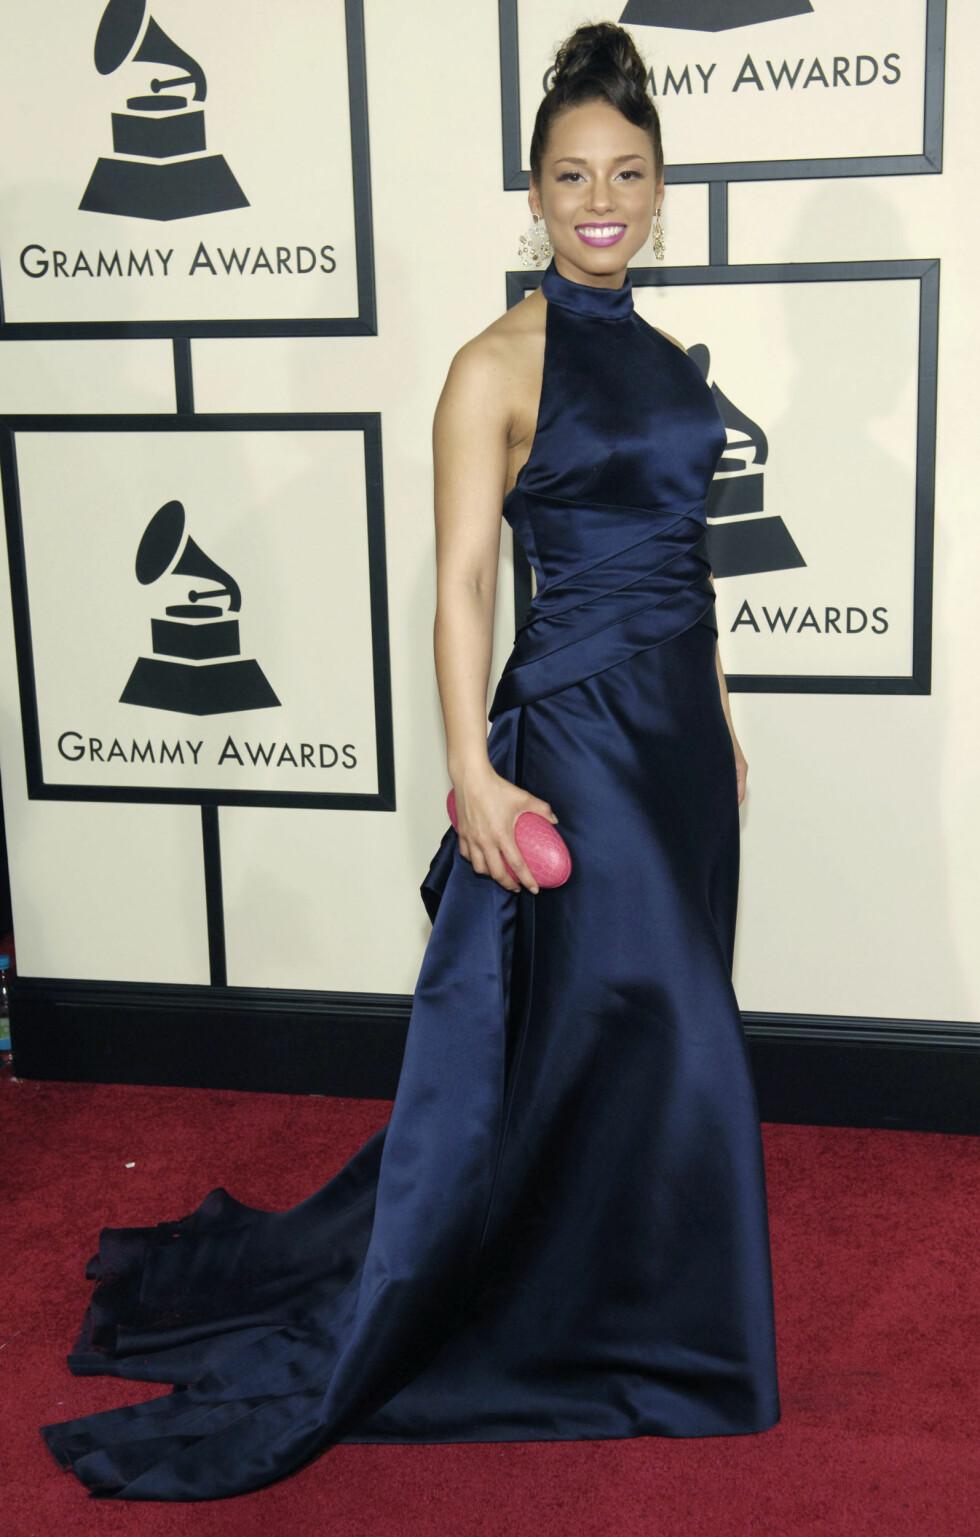 VAKKER: Alicia Keyes på rød løper under Grammy-utdelingen i 2008. Foto: NTB Scanpix